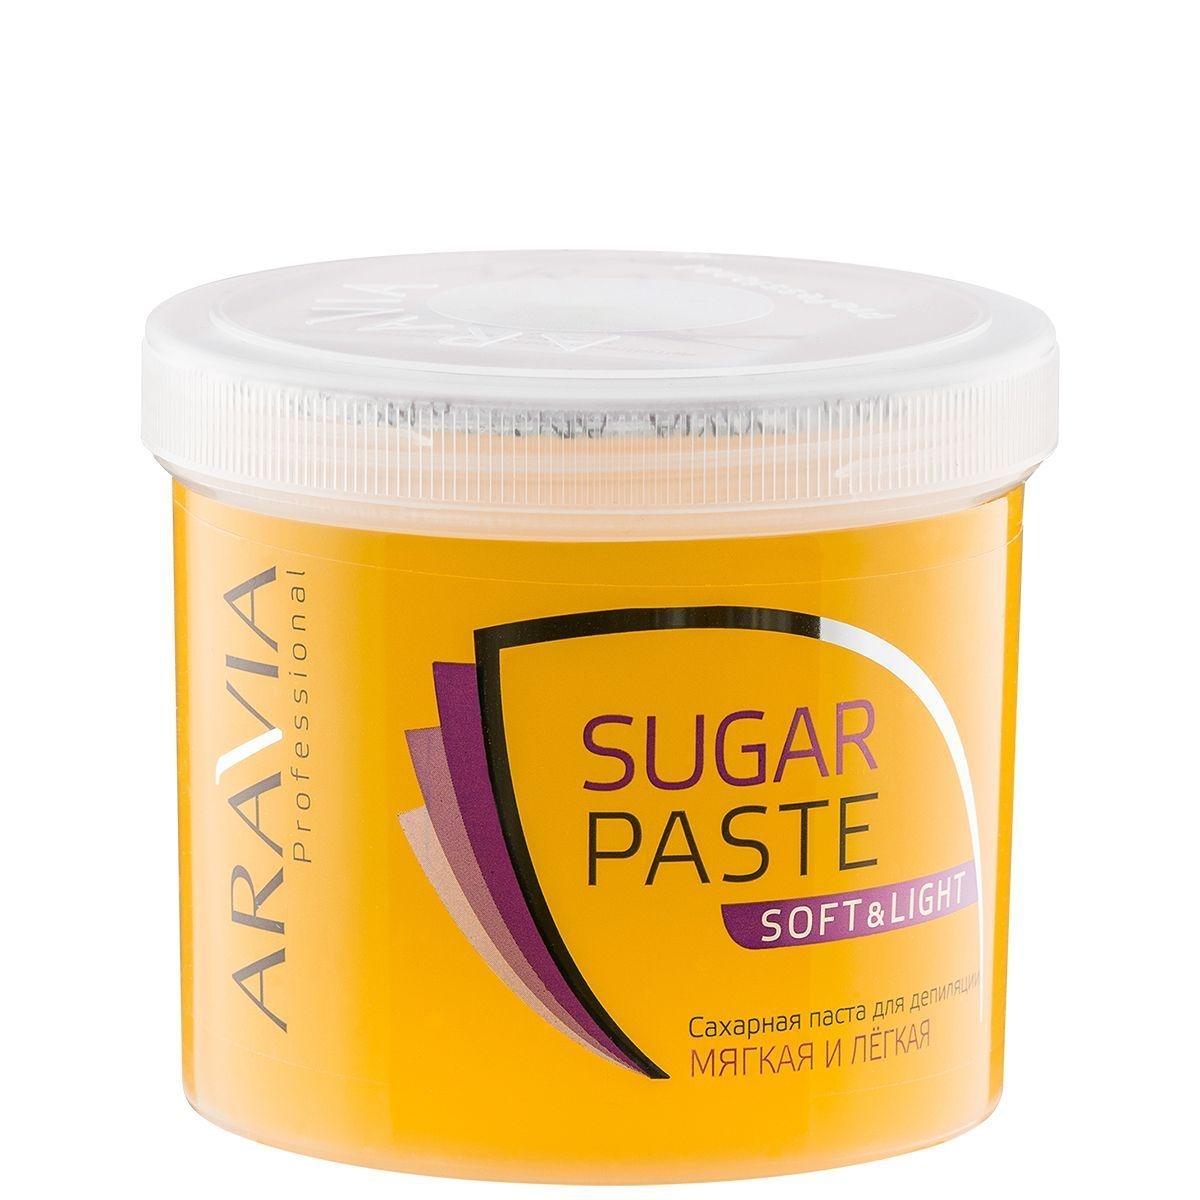 ARAVIA Сахарная Паста для Депиляции Мягкая и Легкая Мягкой Консистенции, 750 гр сахарная паста для депиляции медовая очень мягкой консистенции 750 гр